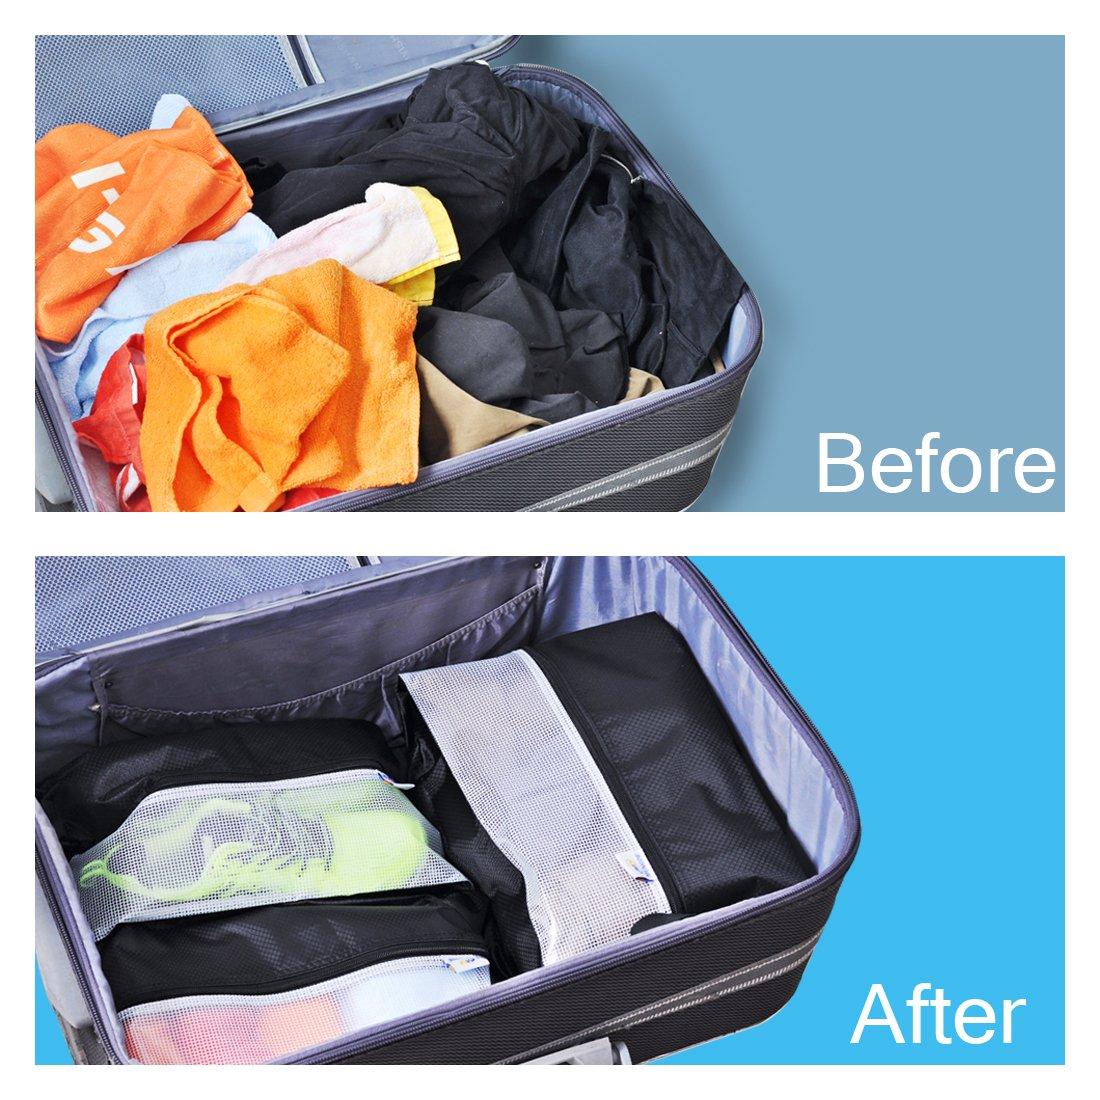 Lermende Travel Shoe Bags Waterproof Nylon Organizer Storage Tote Pouch 5pcs by Lermende (Image #6)